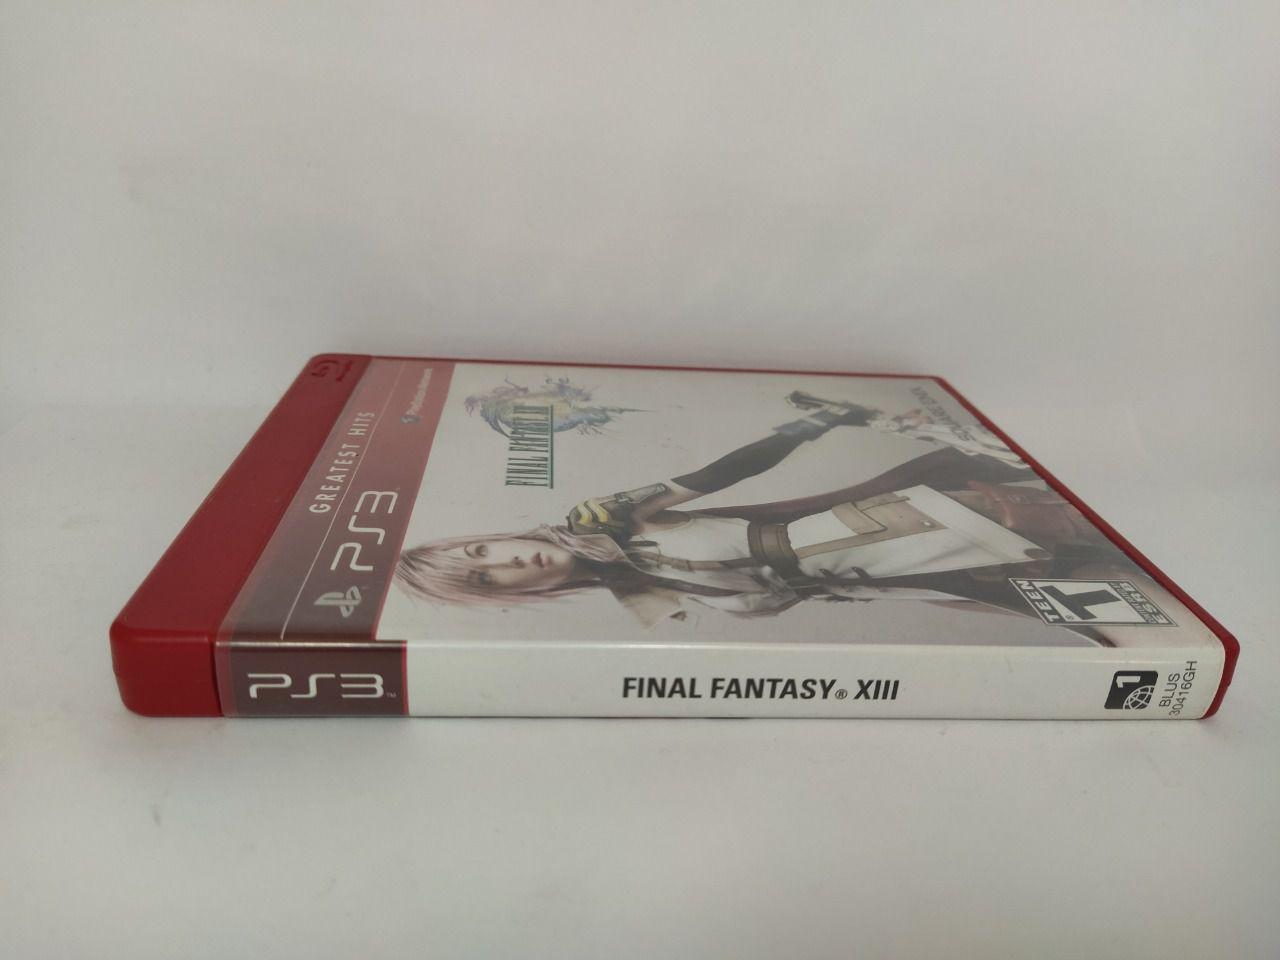 Jogo Ps3 Final Fantasy XIII Mídia Física Usado